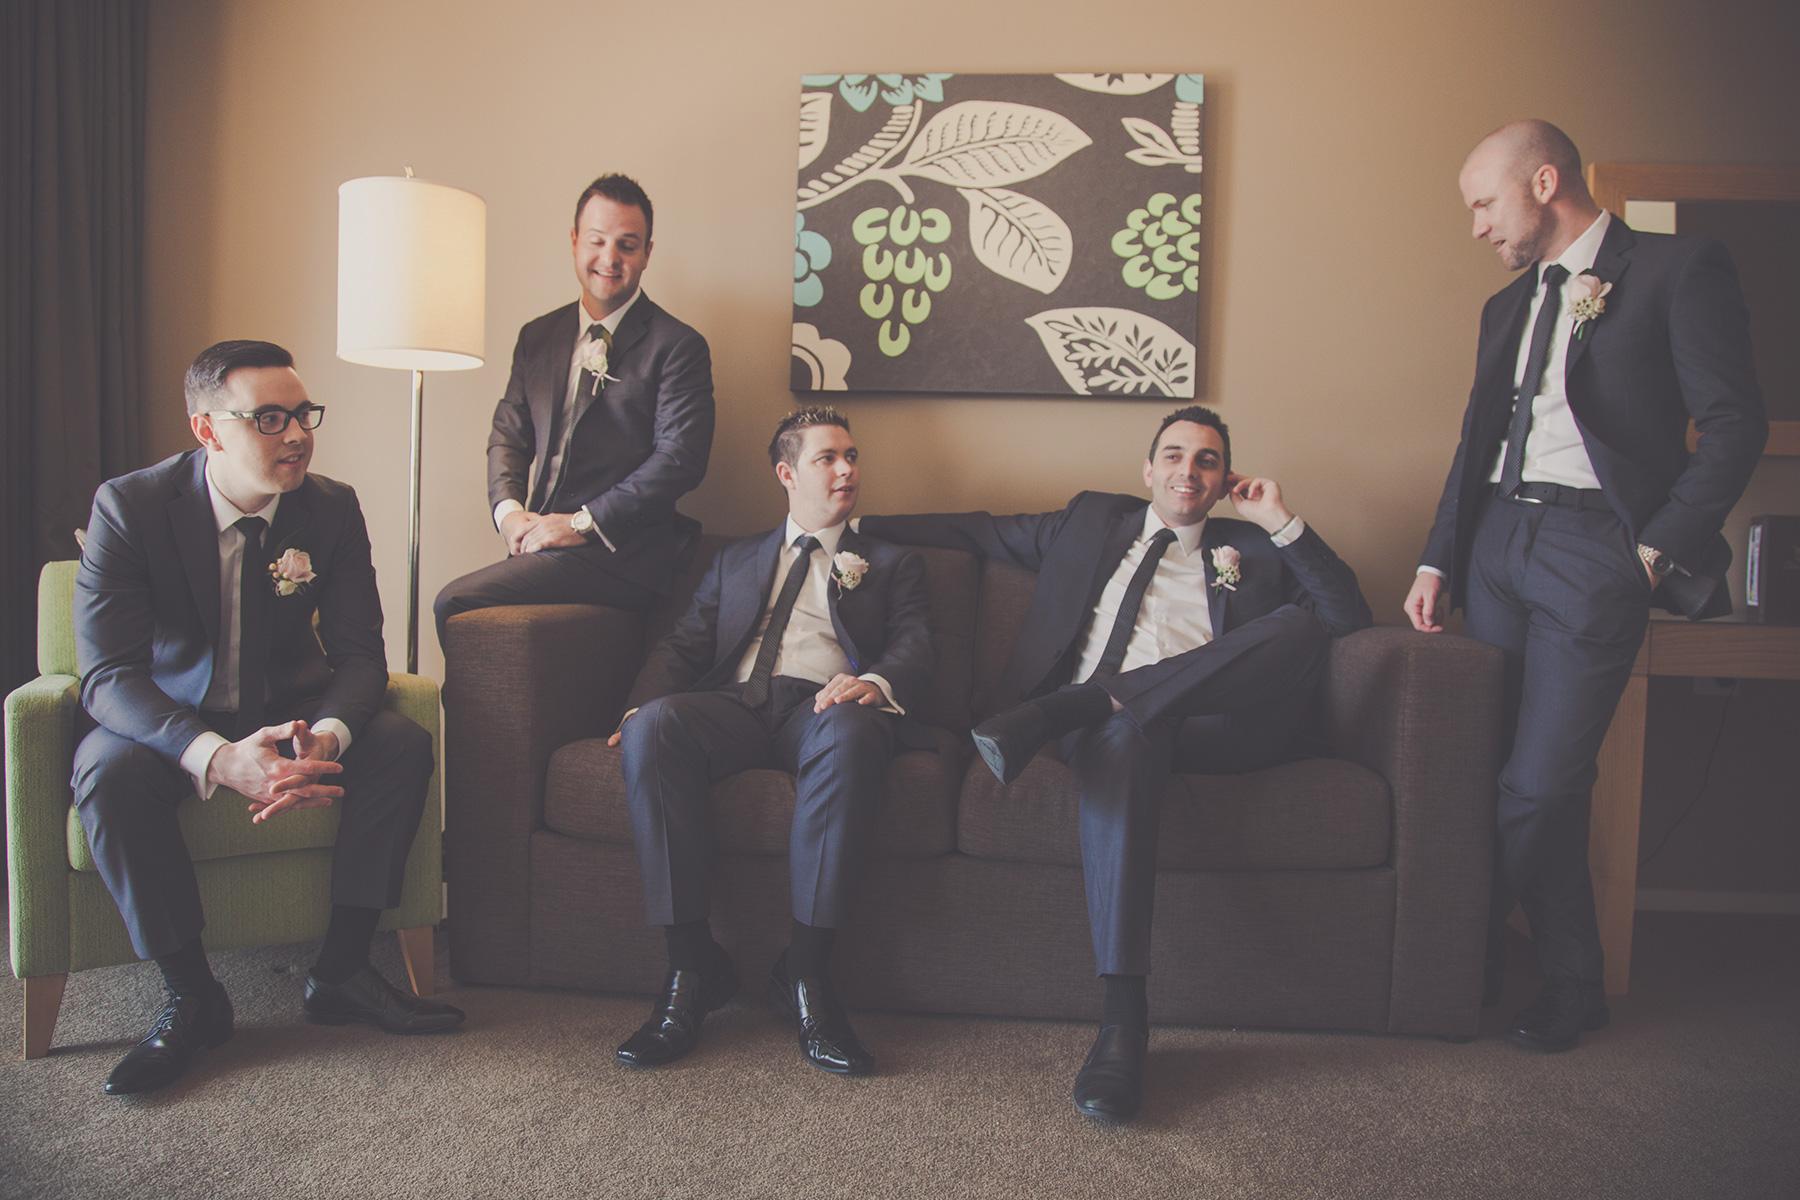 Cherish_Tim_Vintage-Wedding_007